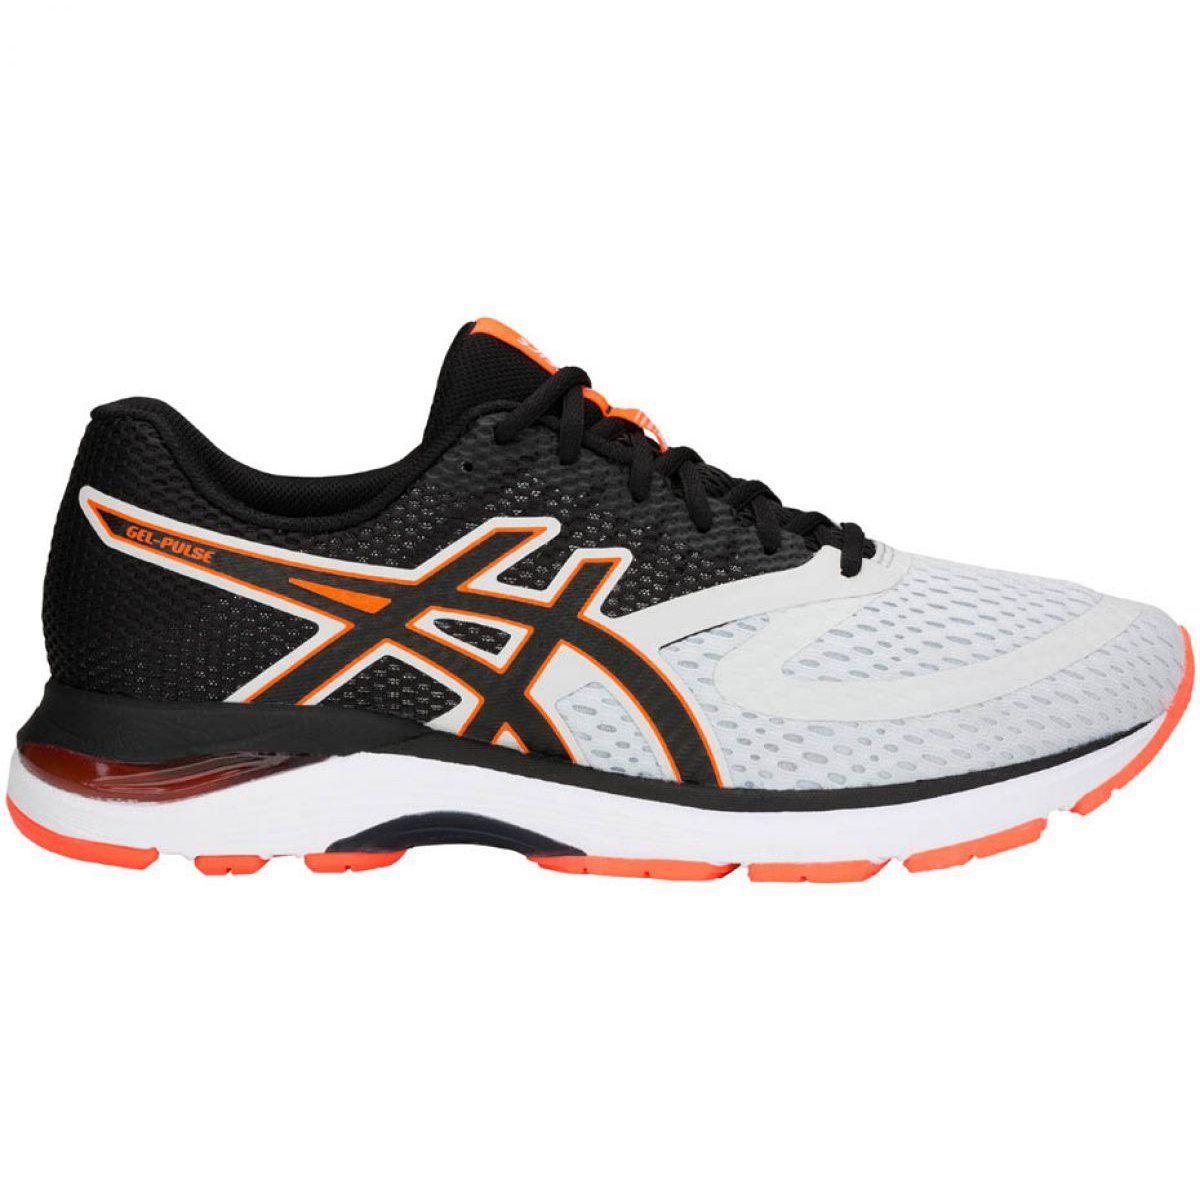 Running Shoes Asics Gel Pulse 10 M 1011a007 020 White Black Orange Asics Gel Pulse Asics Asics Running Shoes